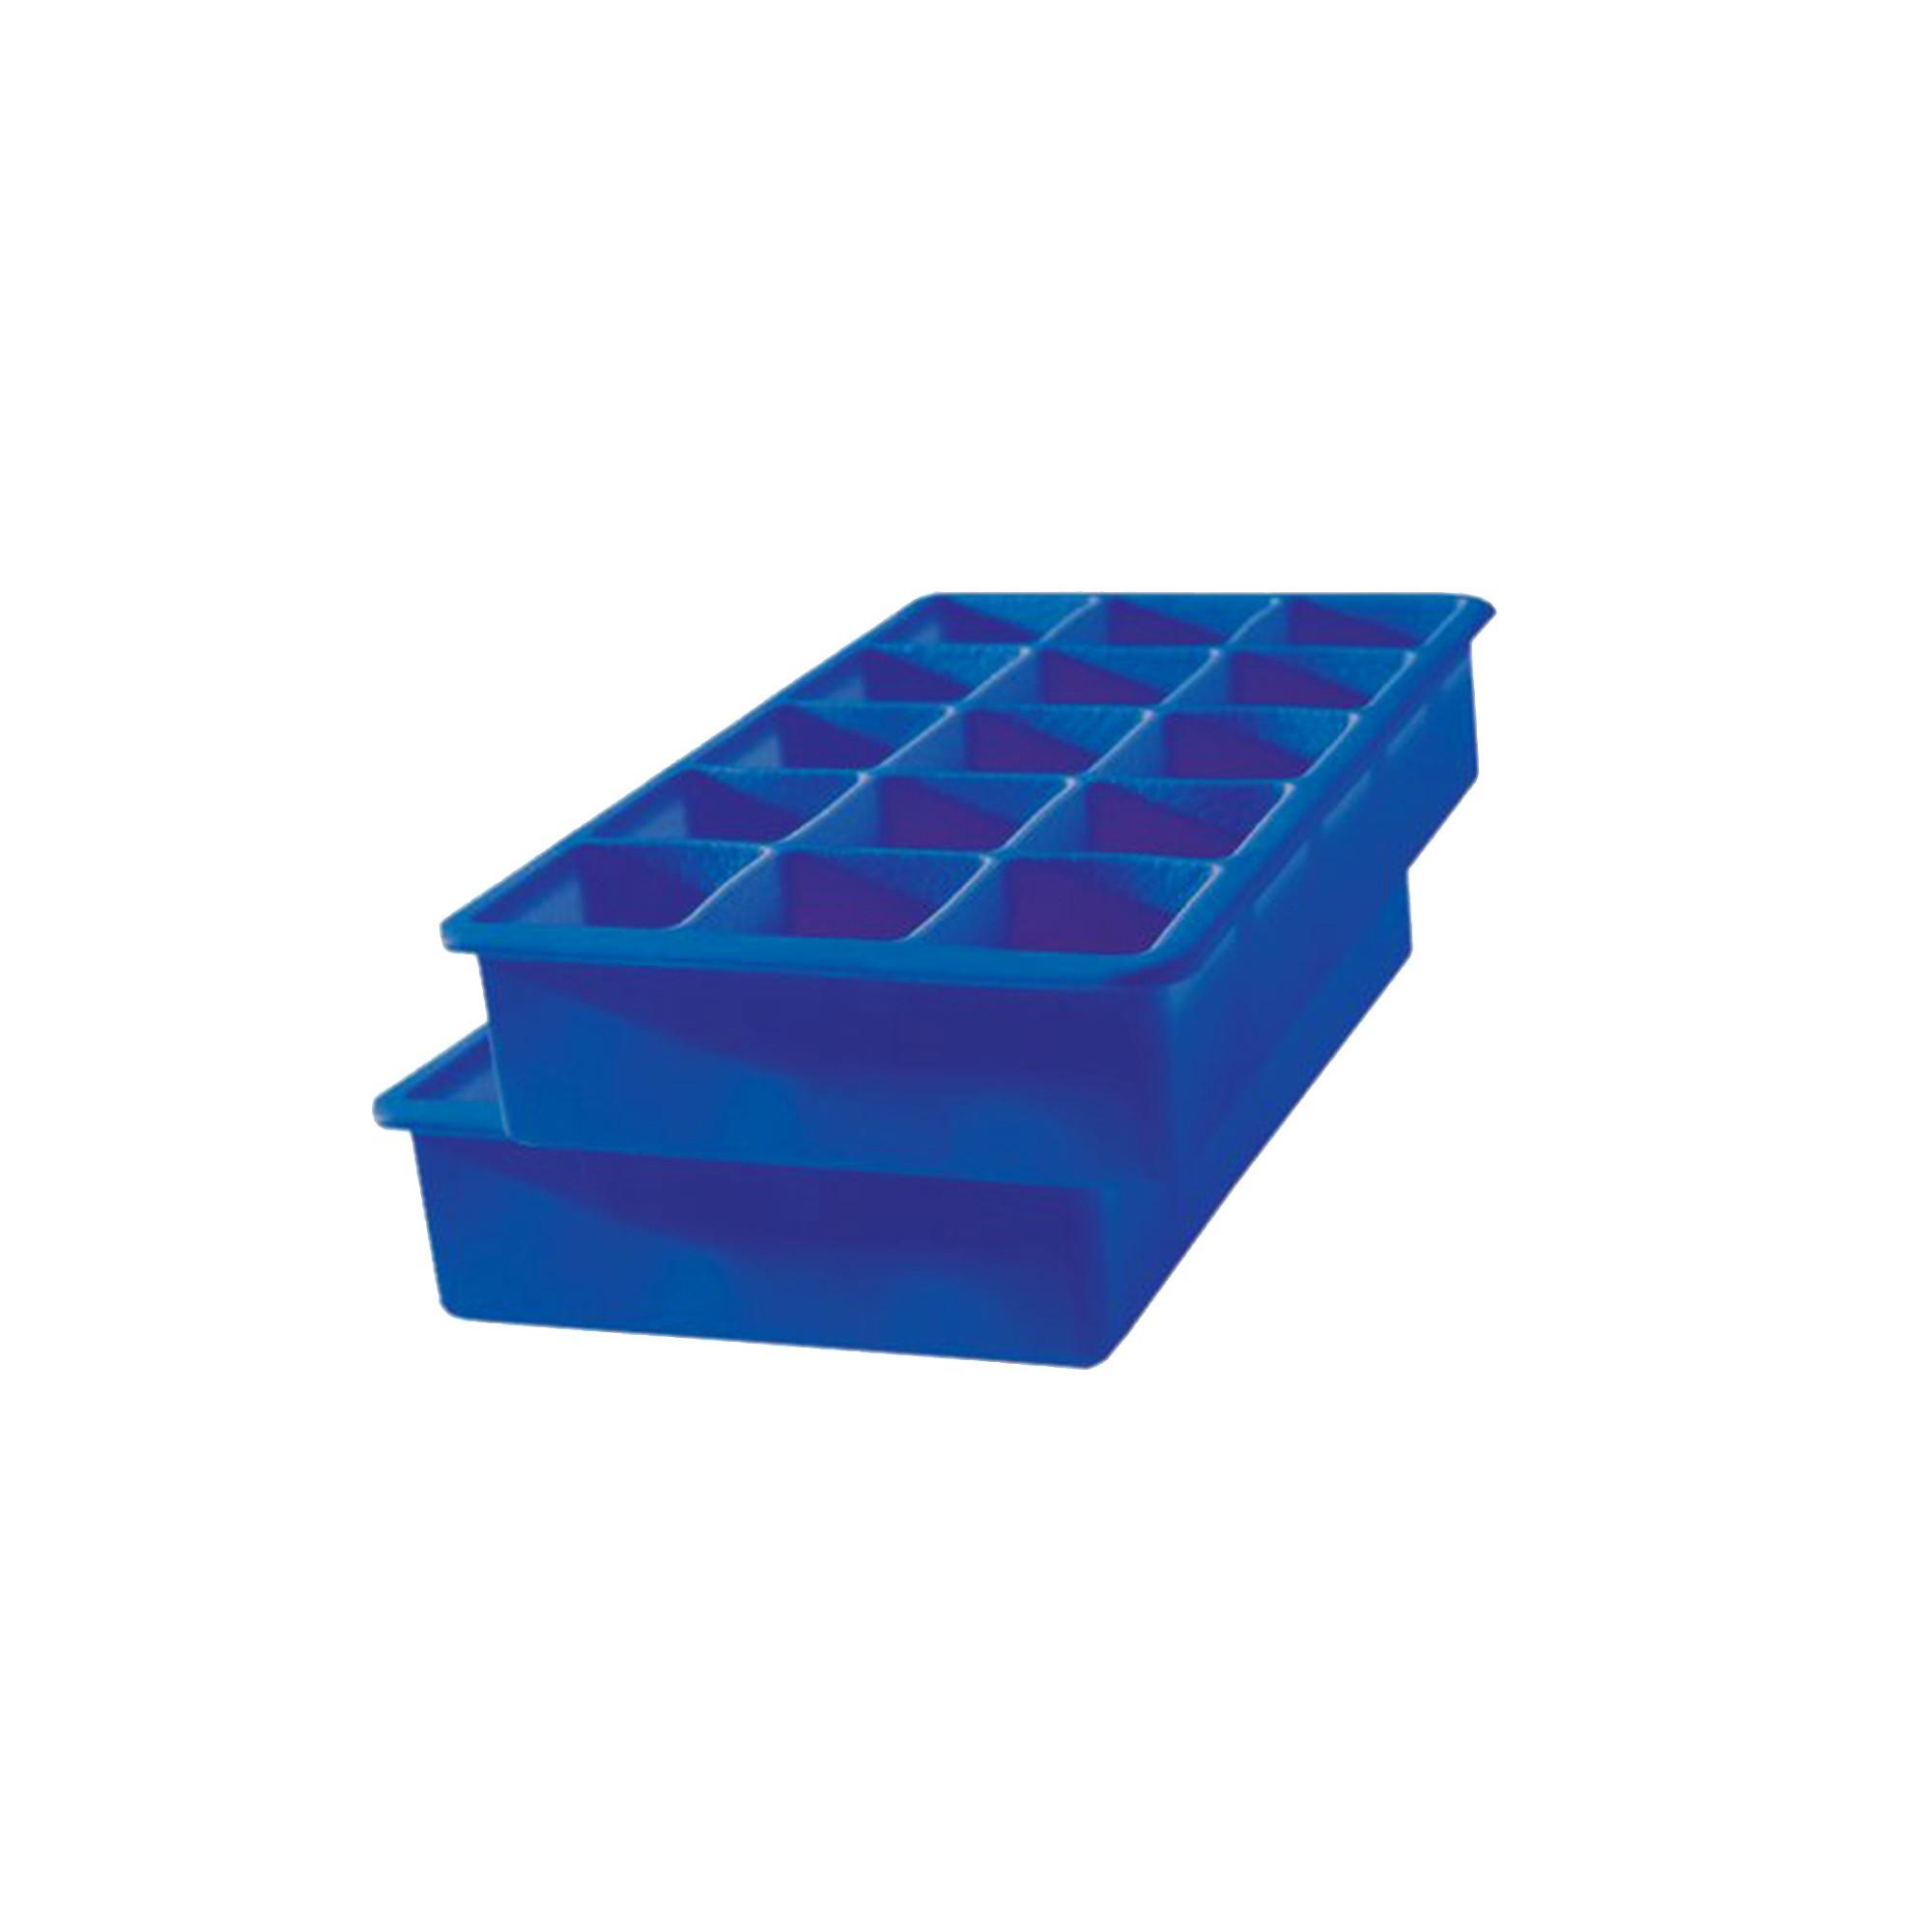 Tovolo Perfect Cube Tray - 2pc - Blue